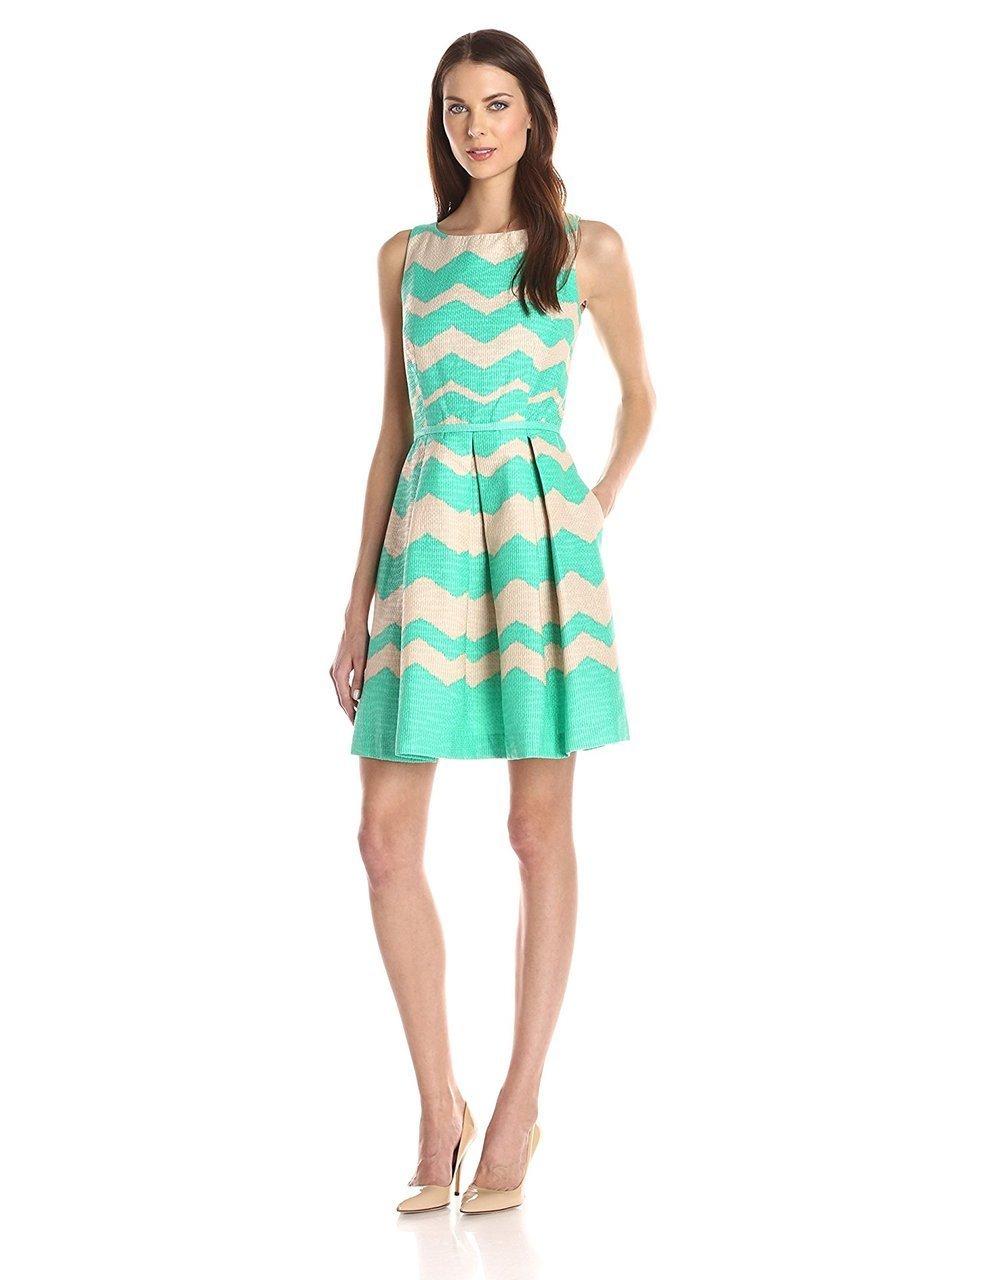 Taylor - Pleated Chevron Jacquard Dress 5445M